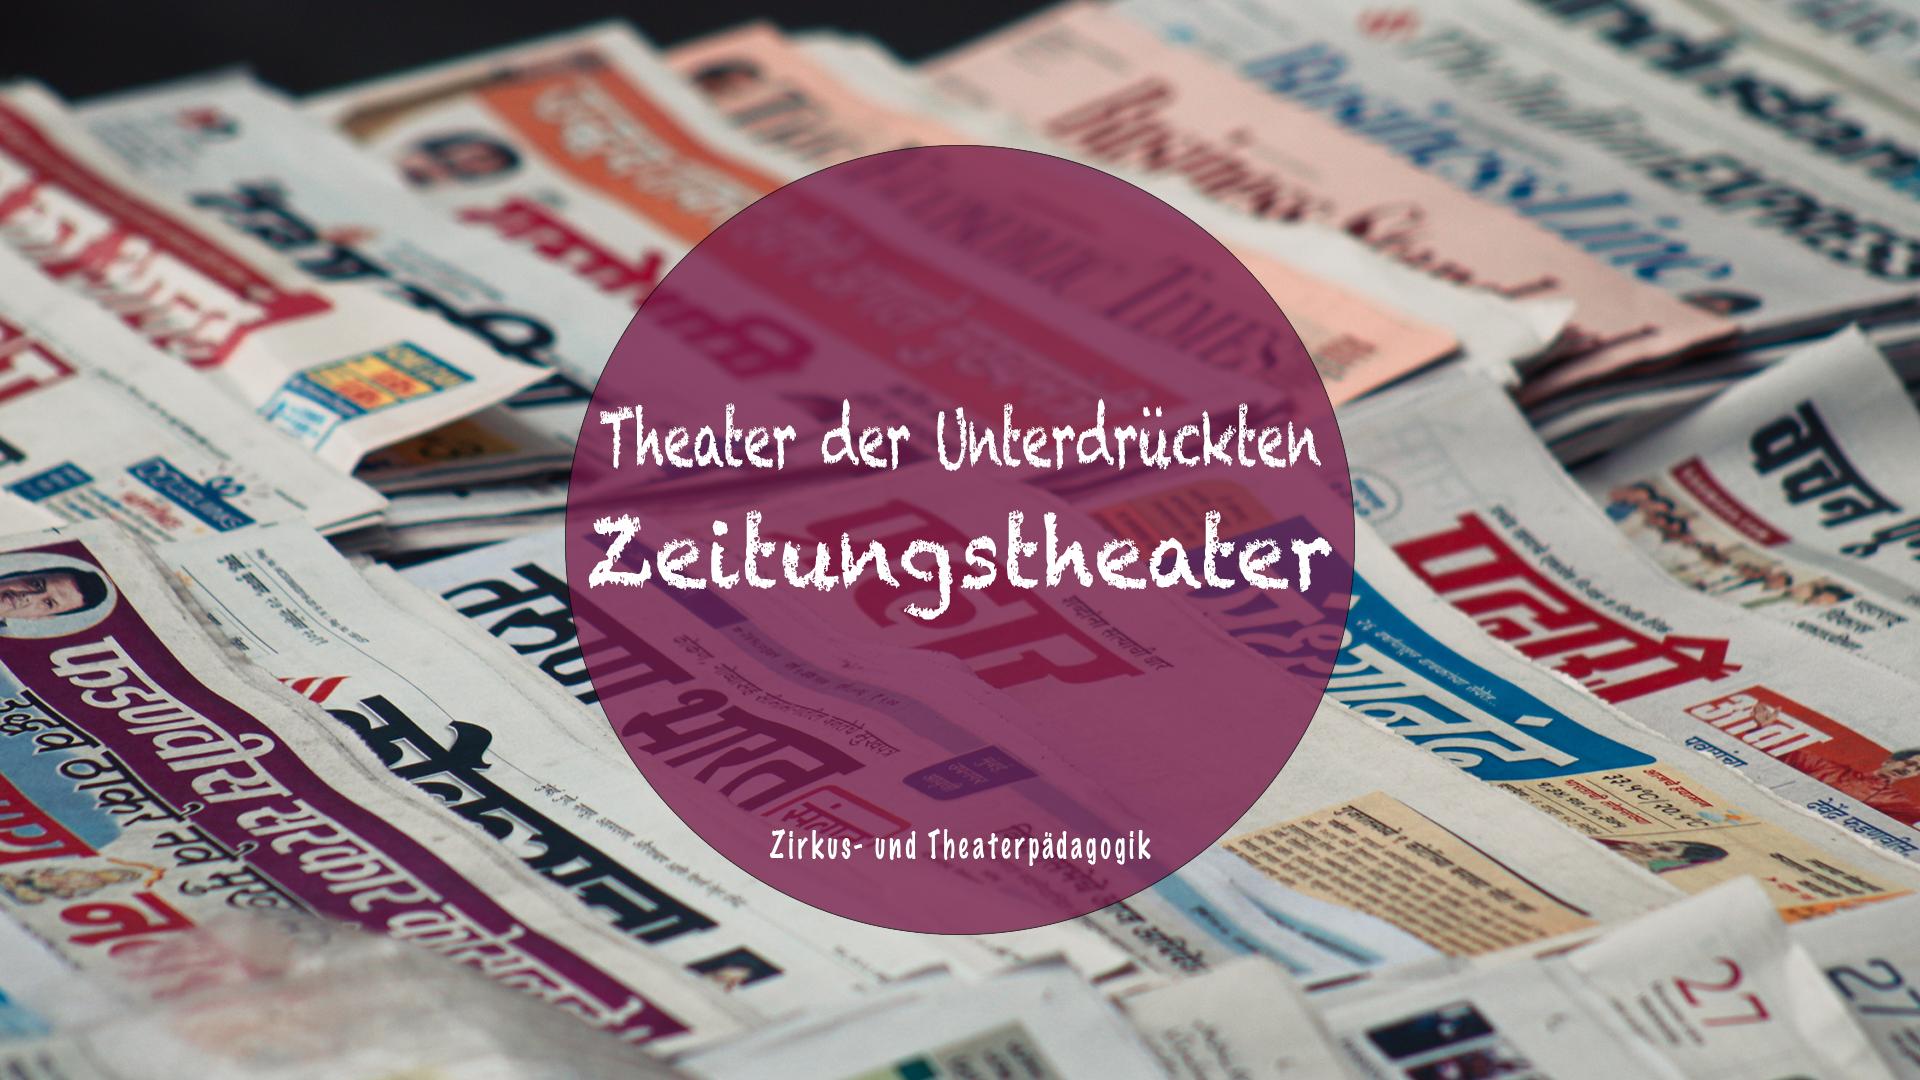 You are currently viewing Zeitungstheater – Theater der Unterdrückten: So gelingt dir Politische Bildung bei jungen Menschen